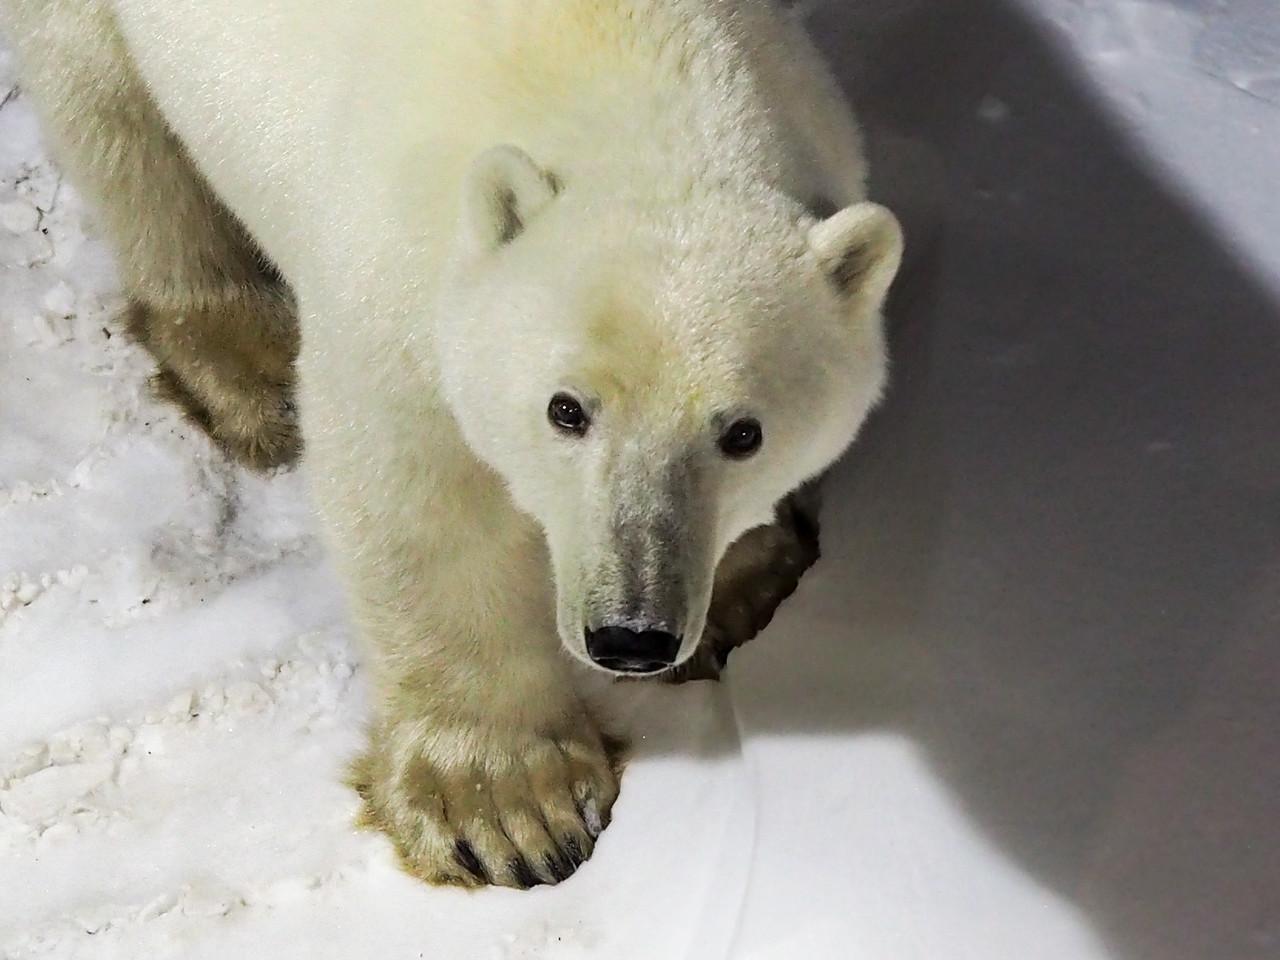 Polar bear in Churchill at night